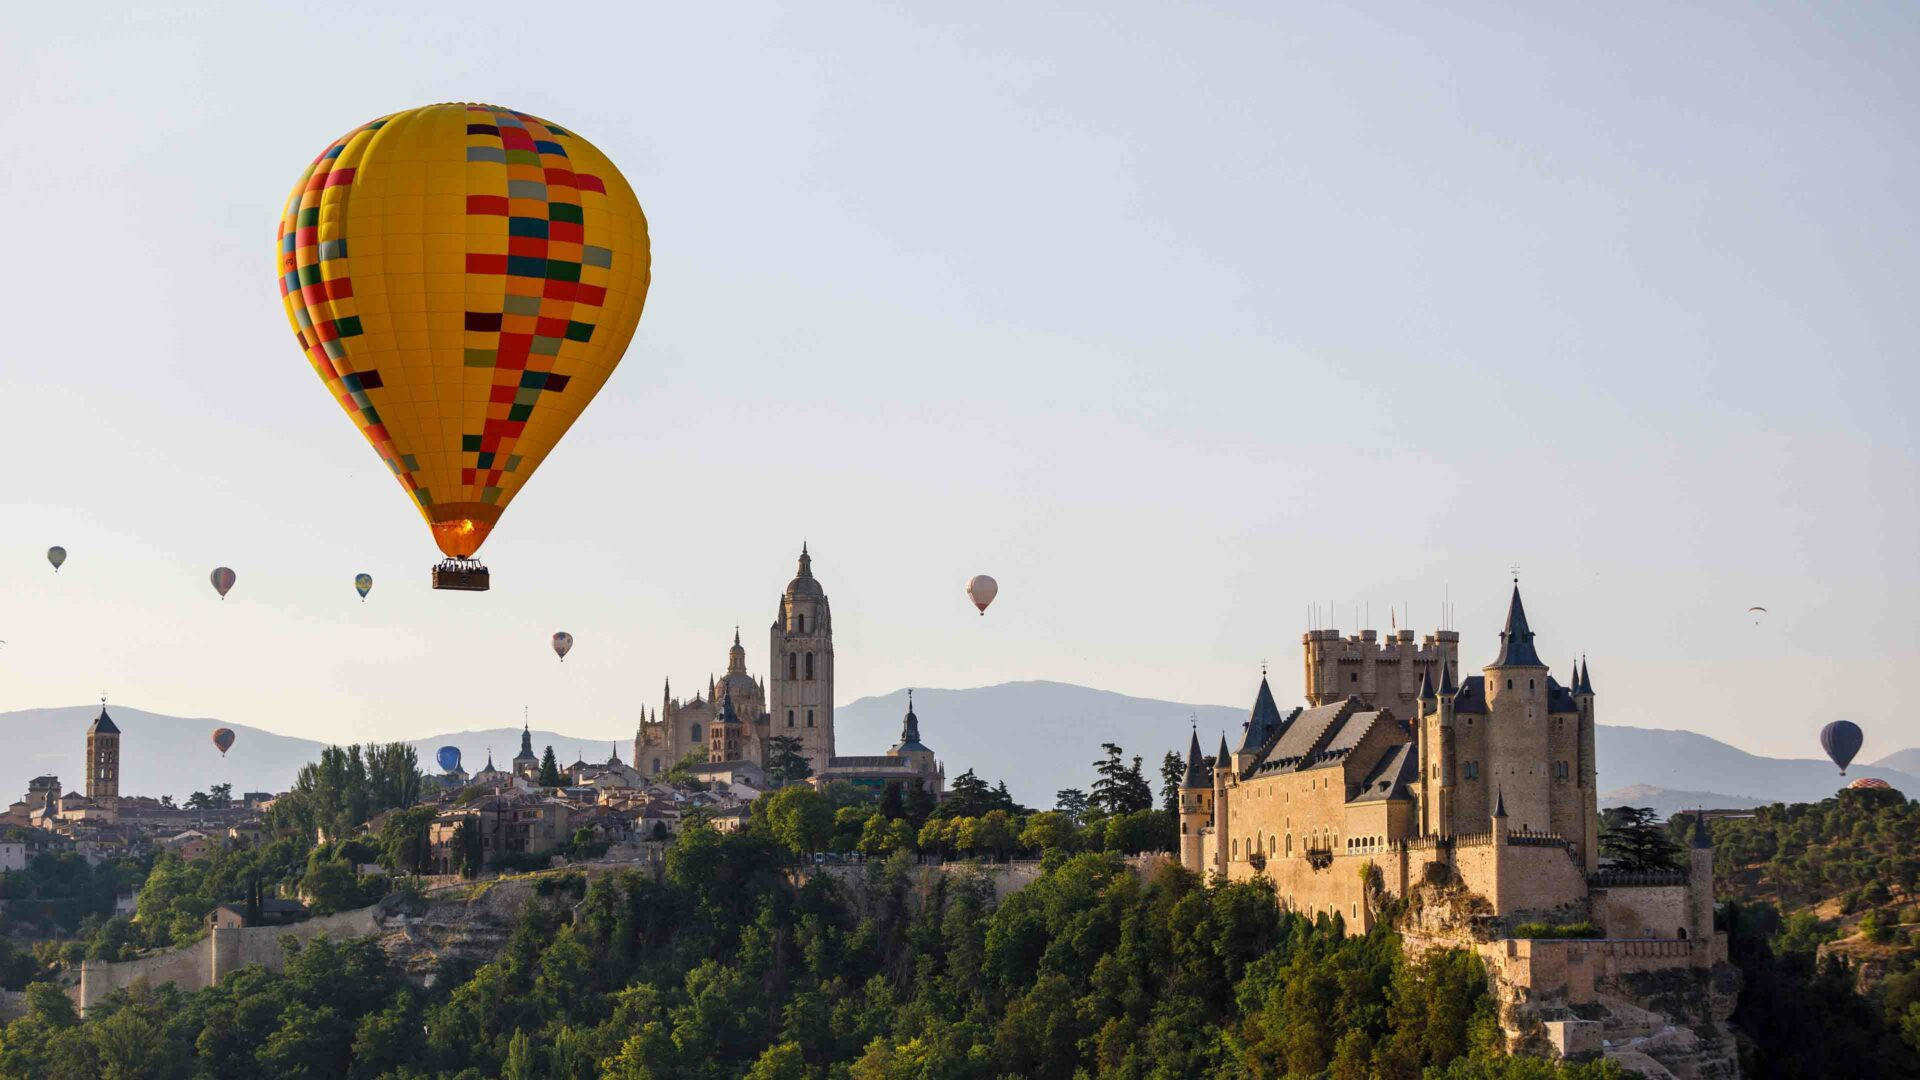 Catalonie Balloon Festival